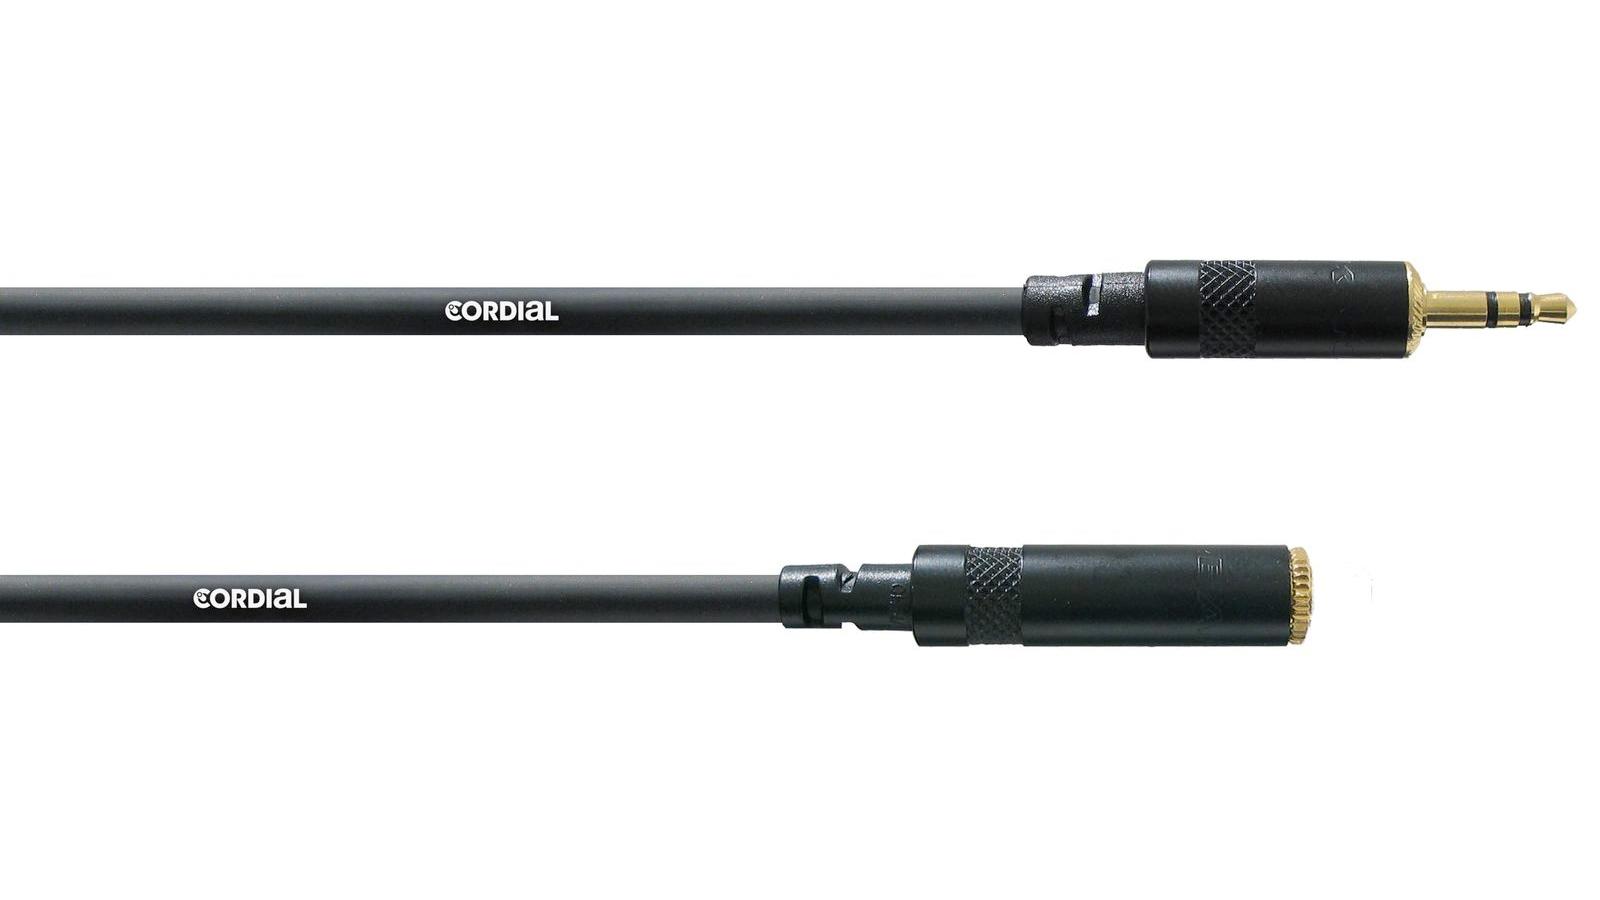 Cordial Verlängerung Mini Klinke 5 m  CFS 5 WY